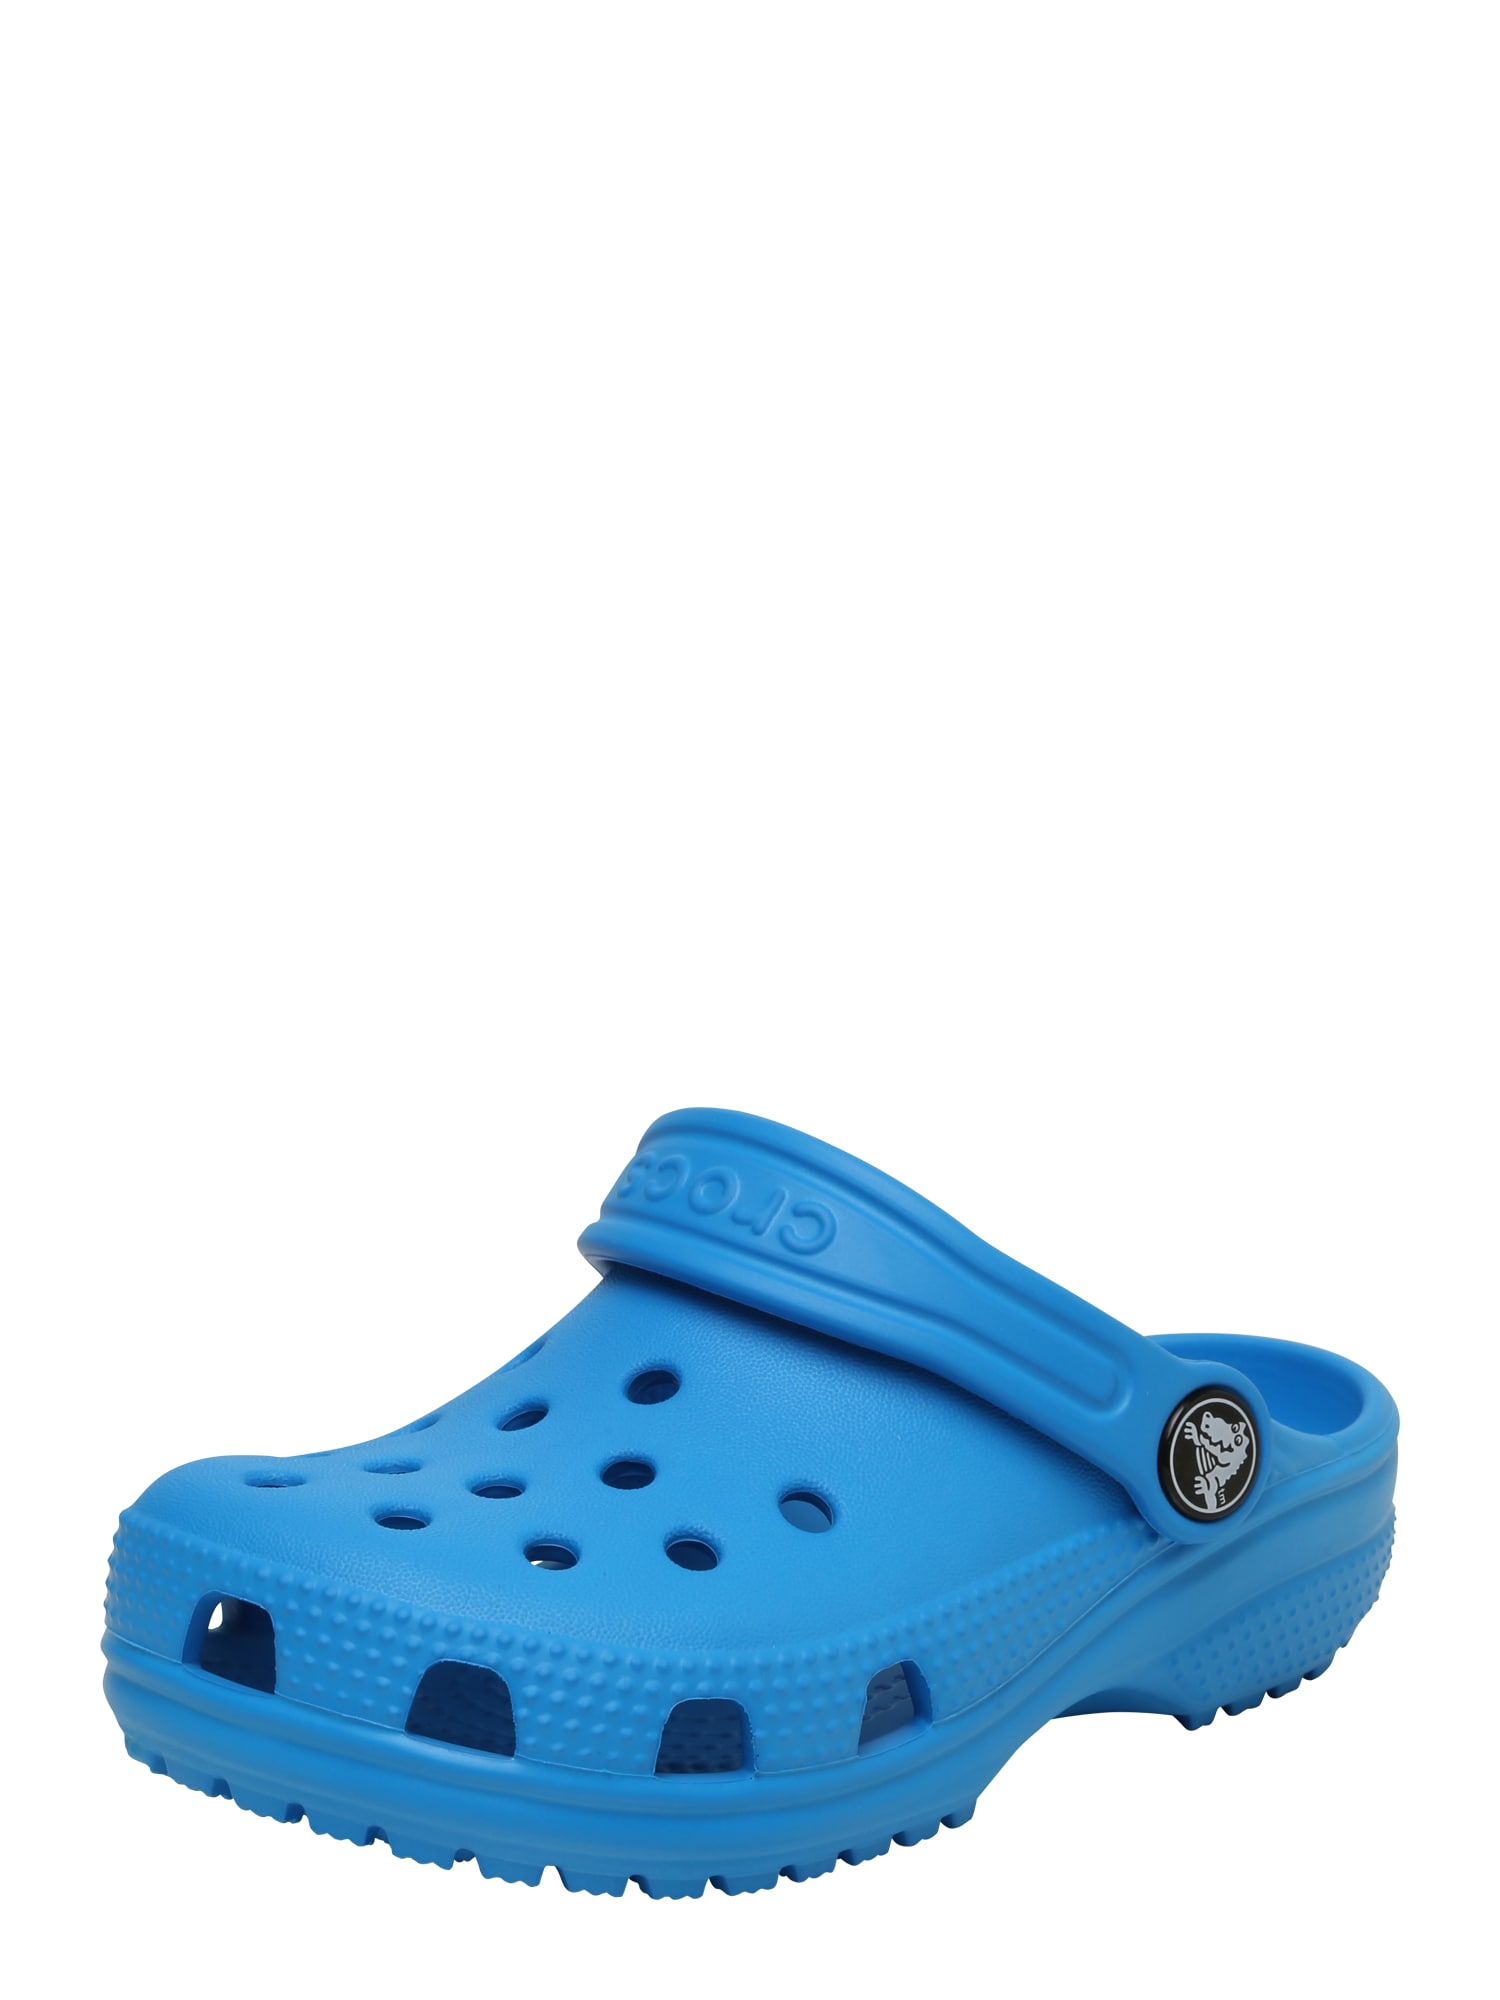 Crocs Atviri batai mėlyna